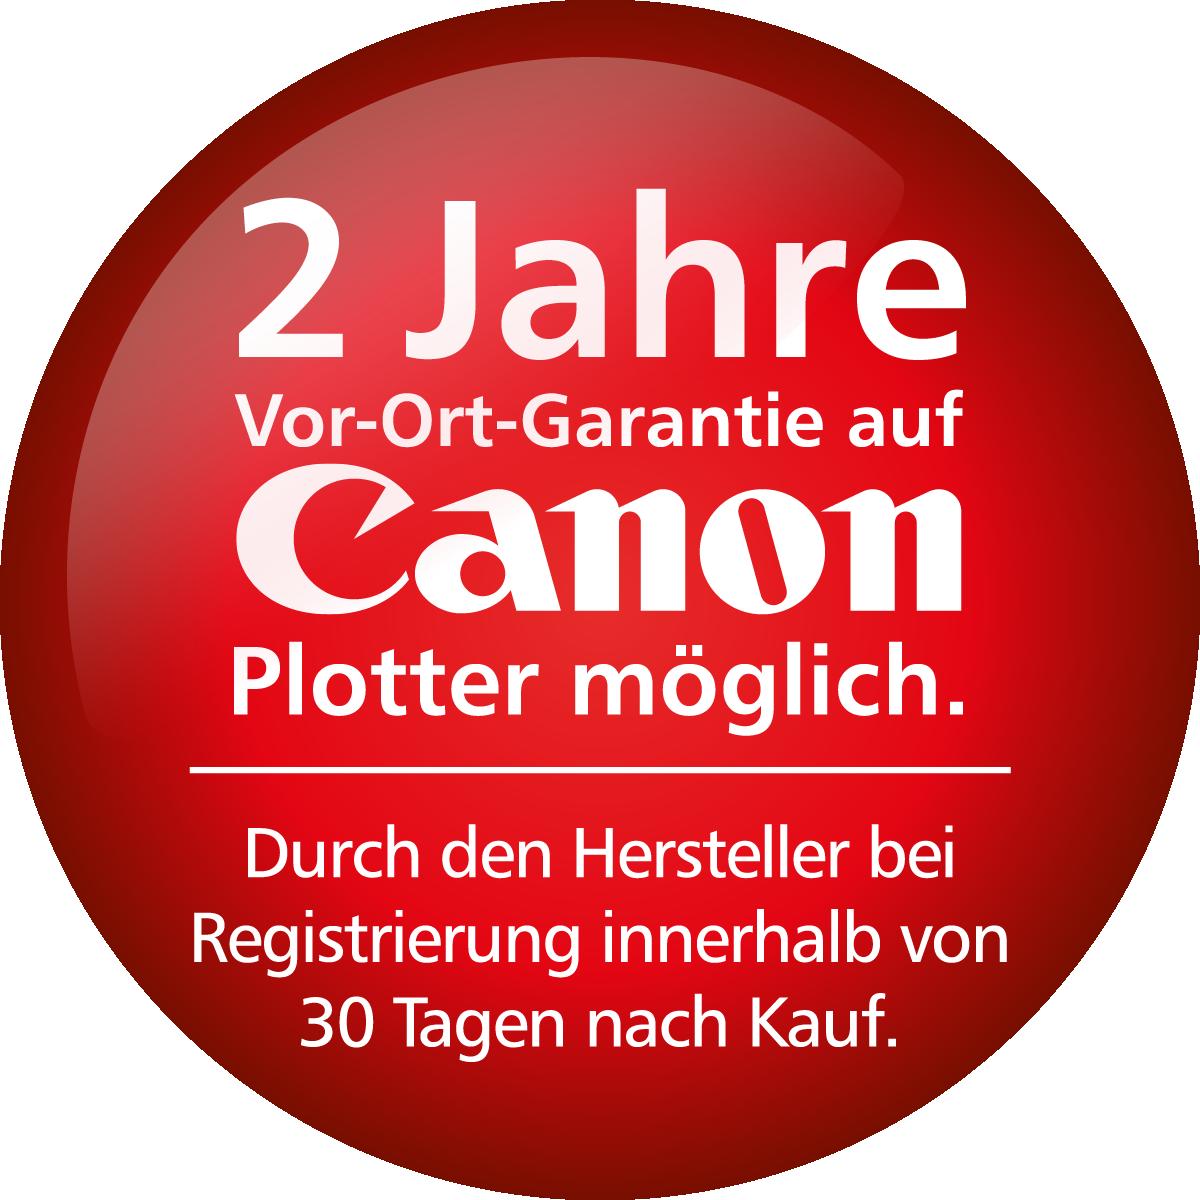 CanonGarantie